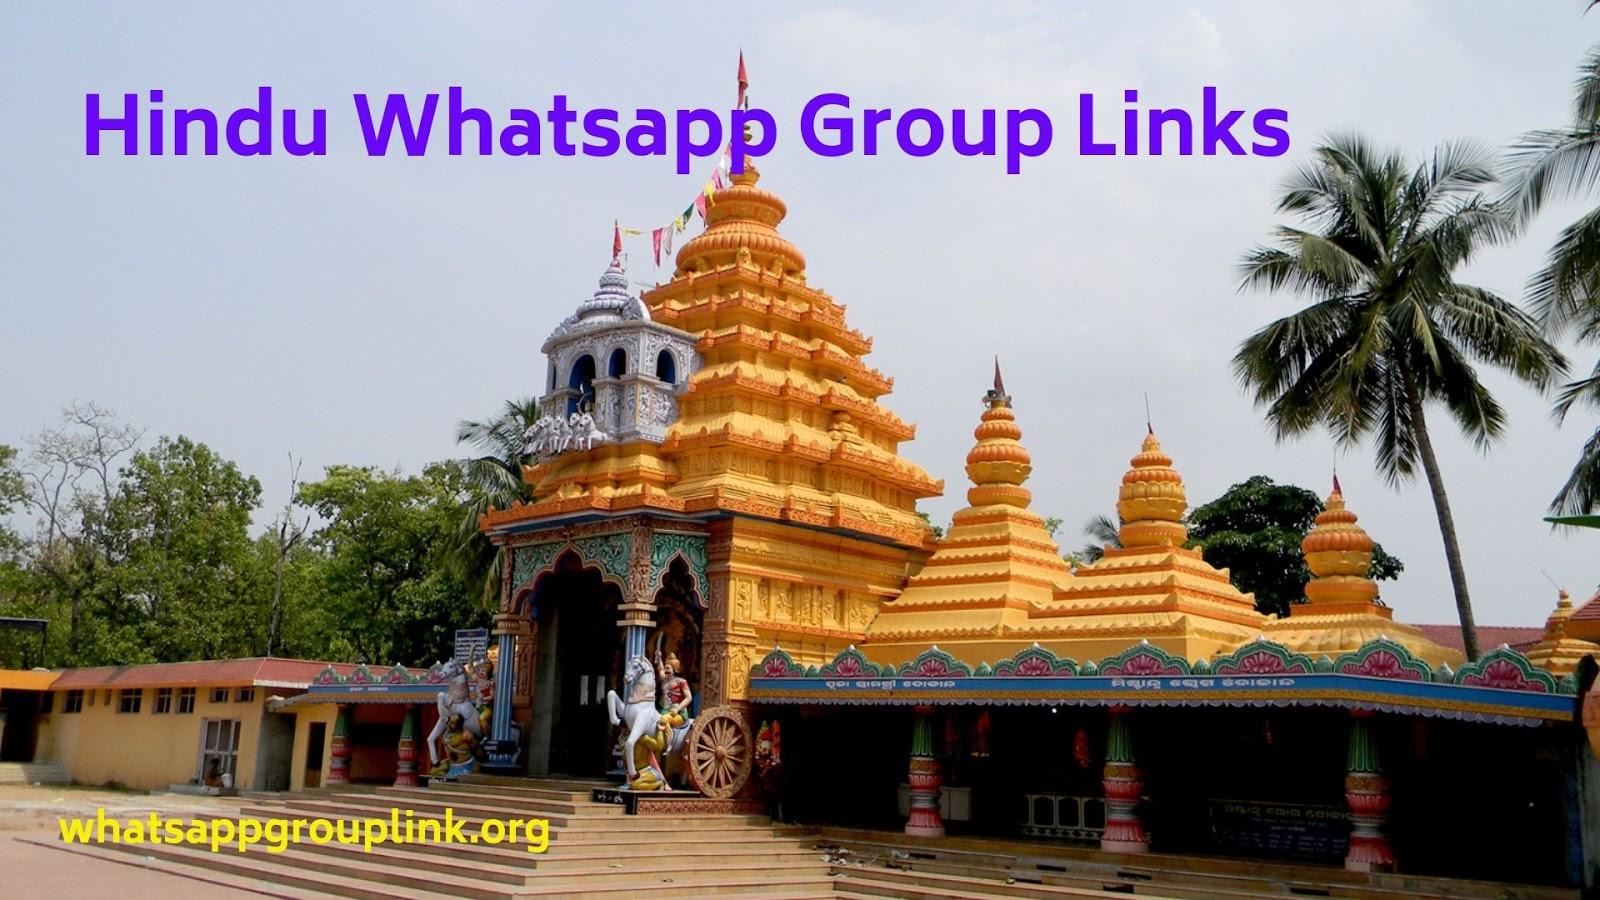 Whatsapp Group Link: Hindu Whatsapp Group Links